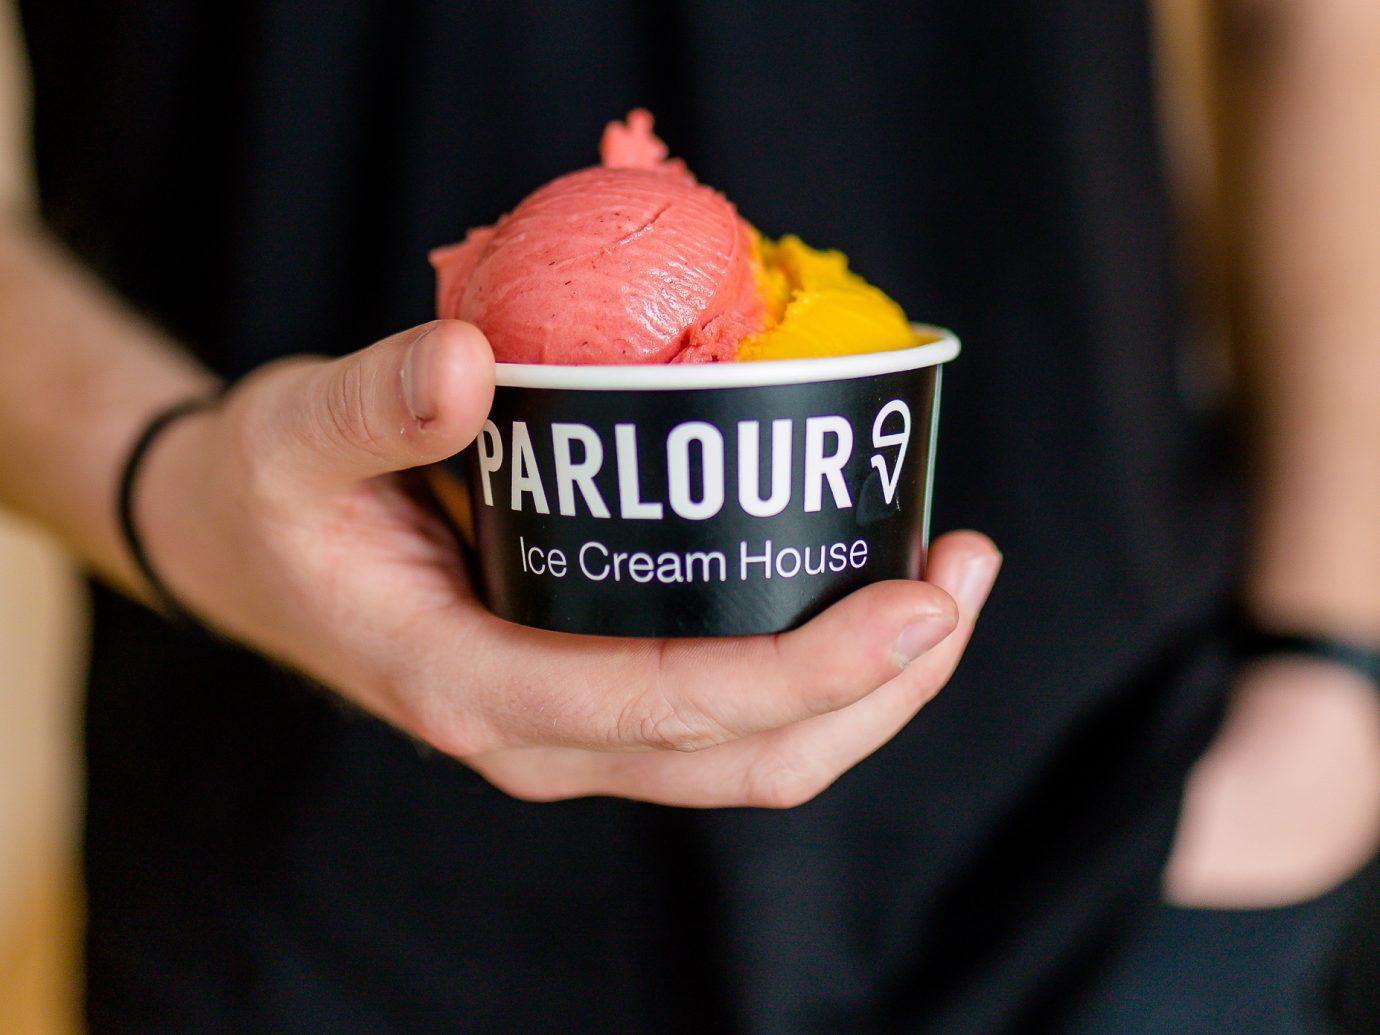 Parlour Ice Cream House